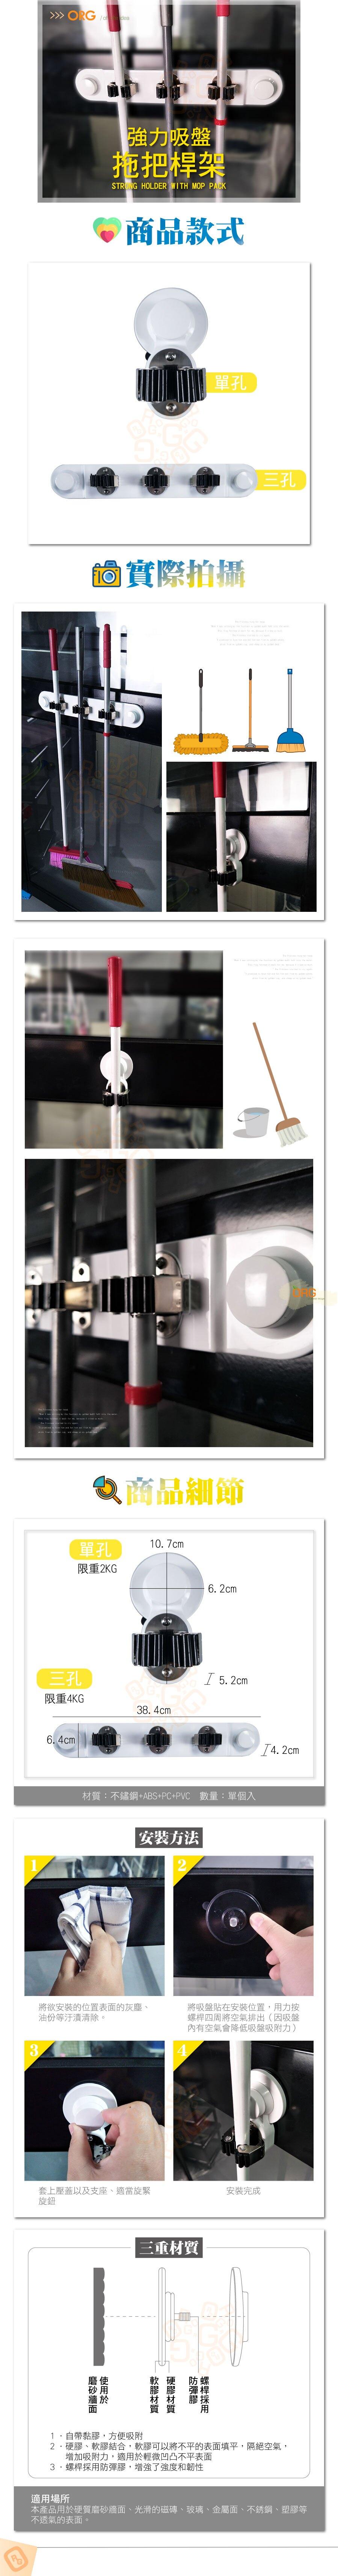 ORG《SD1499a》耐用!單孔/3孔 拖把桿架 吸盤 拖把架 工具架 掃除工具 置物架 拖把夾 掃把夾 不鏽鋼拖把架